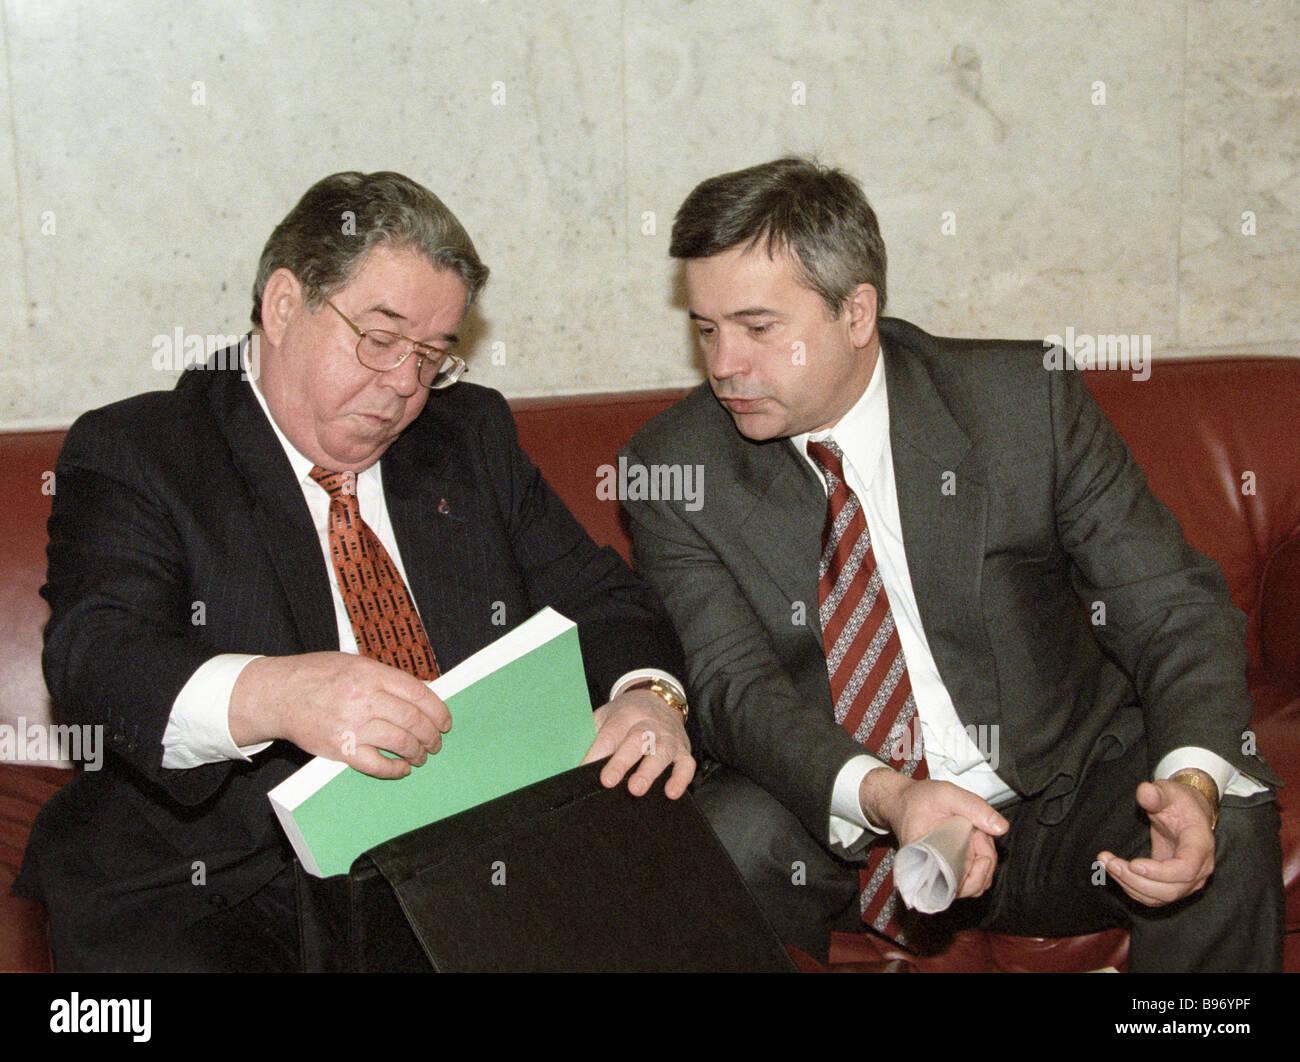 Rem Vyakhirev Gazprom board chairman and Vagit Alekperov LUKoil president - Stock Image